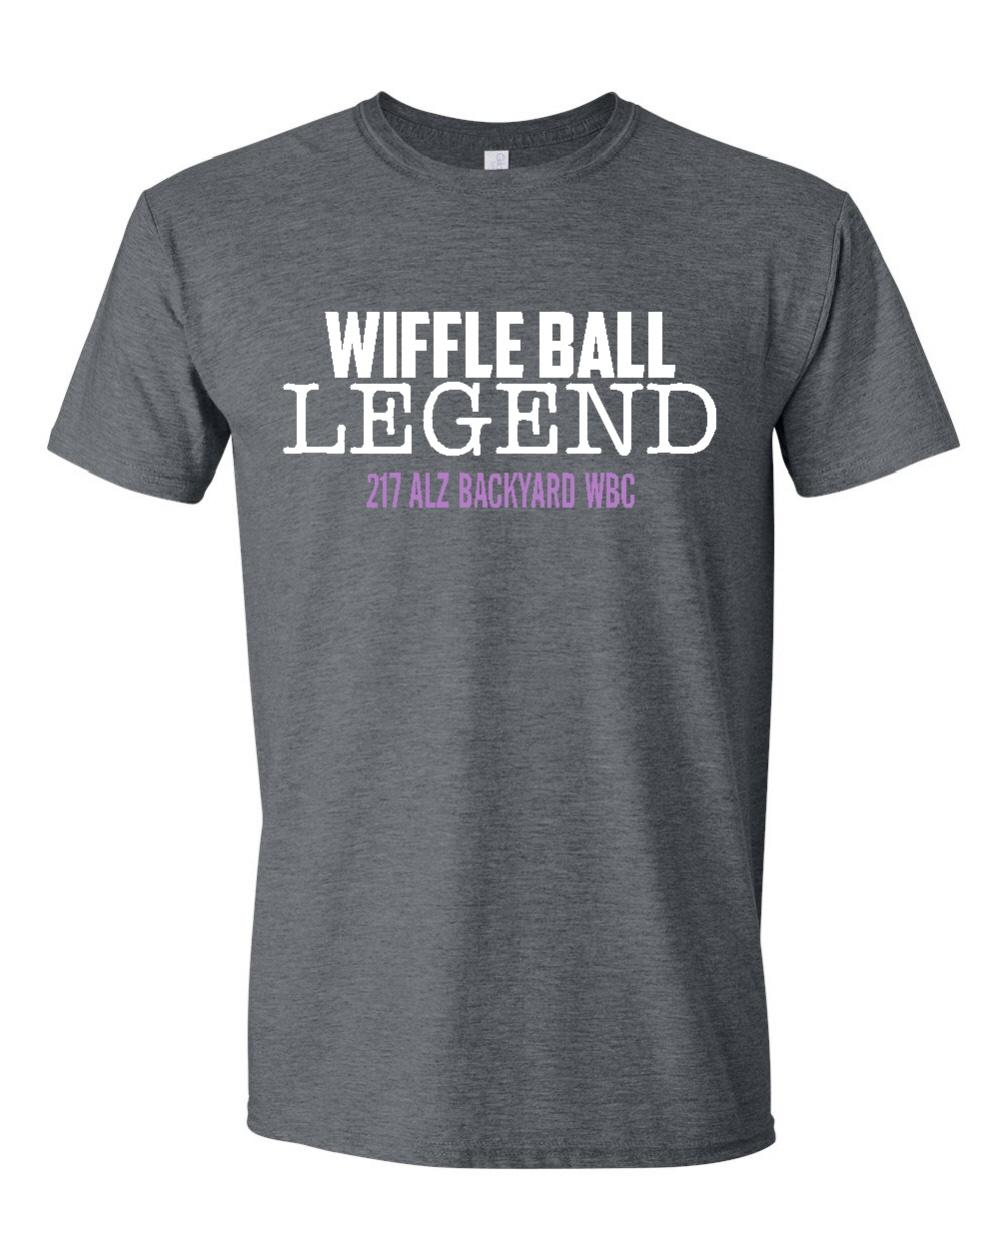 Wiffle ball legend